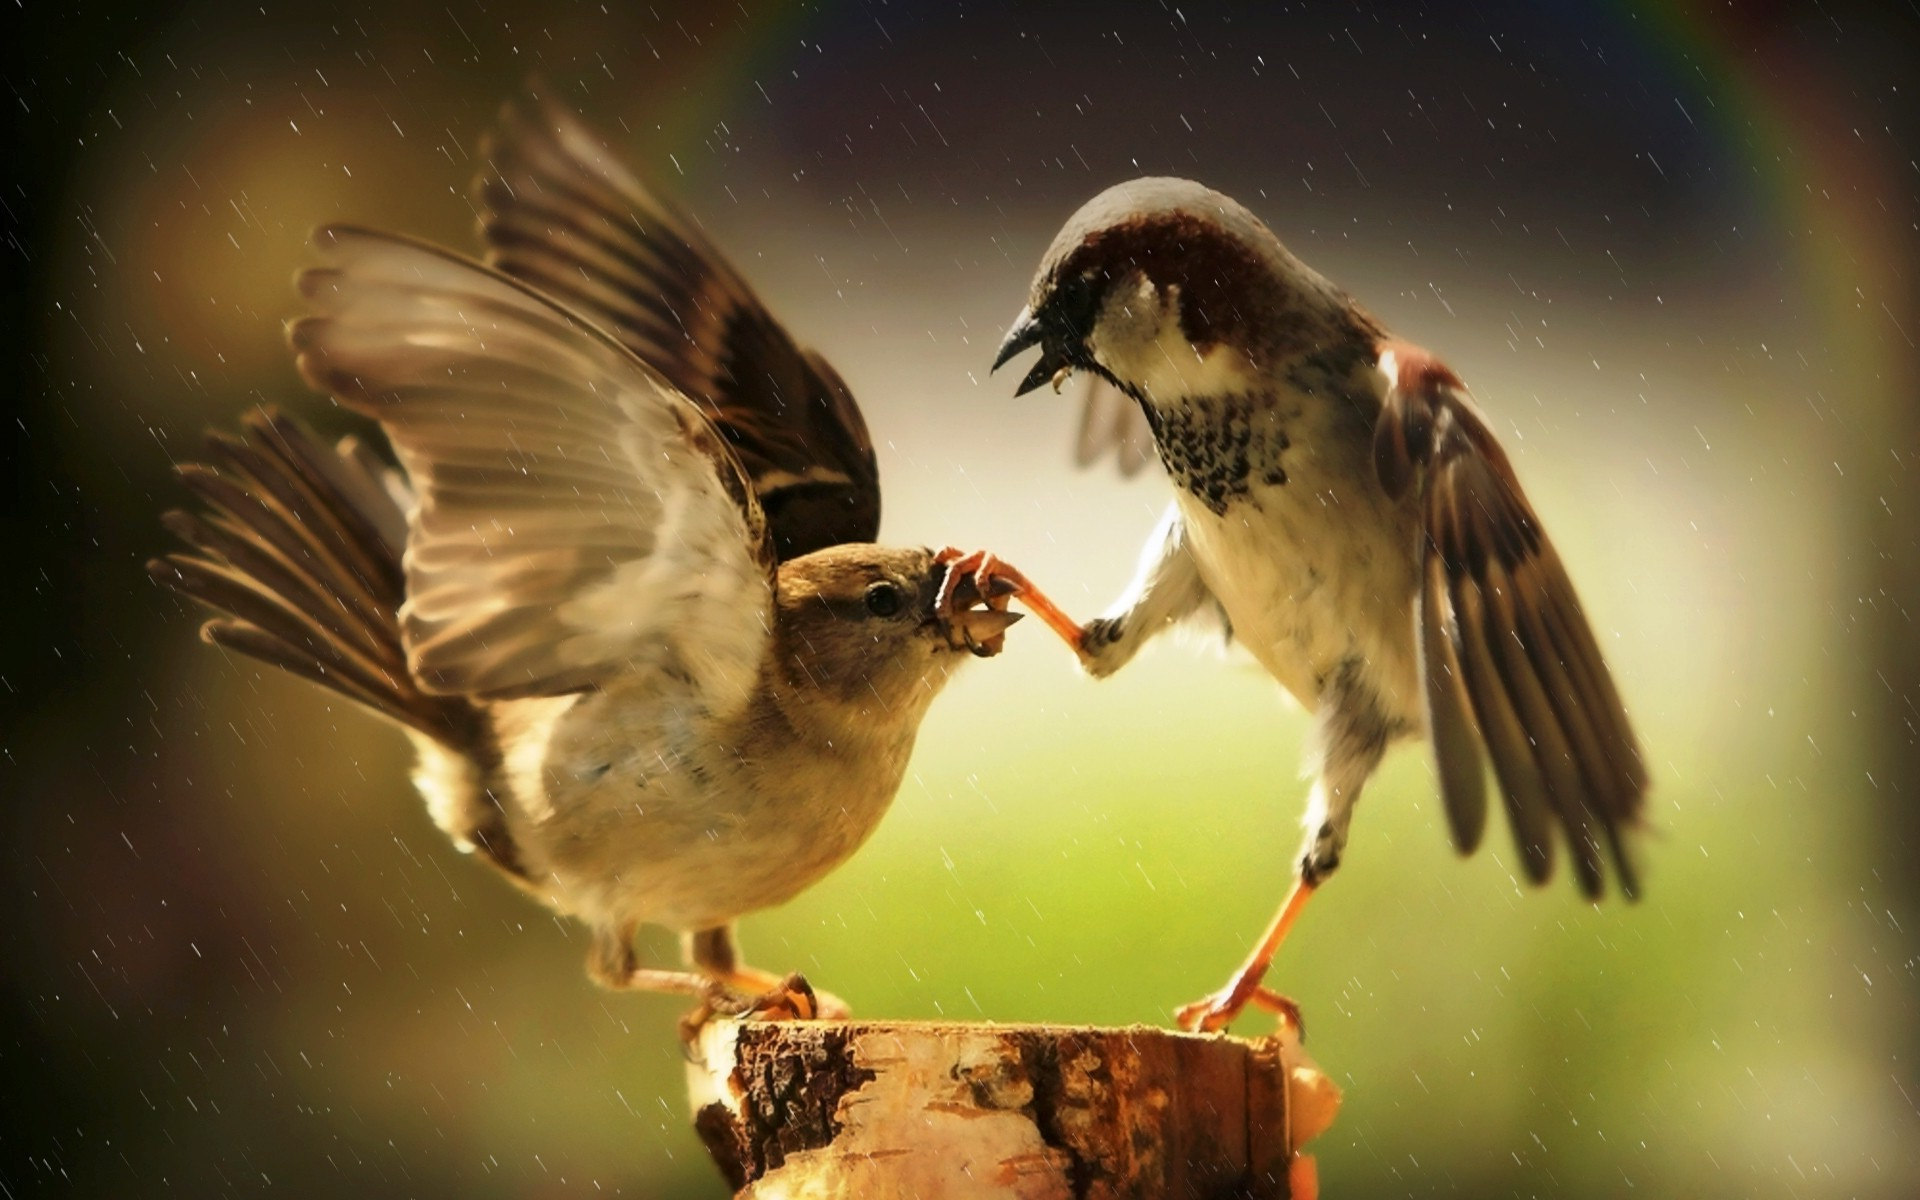 Angry Bird Space Wallpaper 3d Birds Animals Sparrows Rainbows Rain Humor Wallpapers